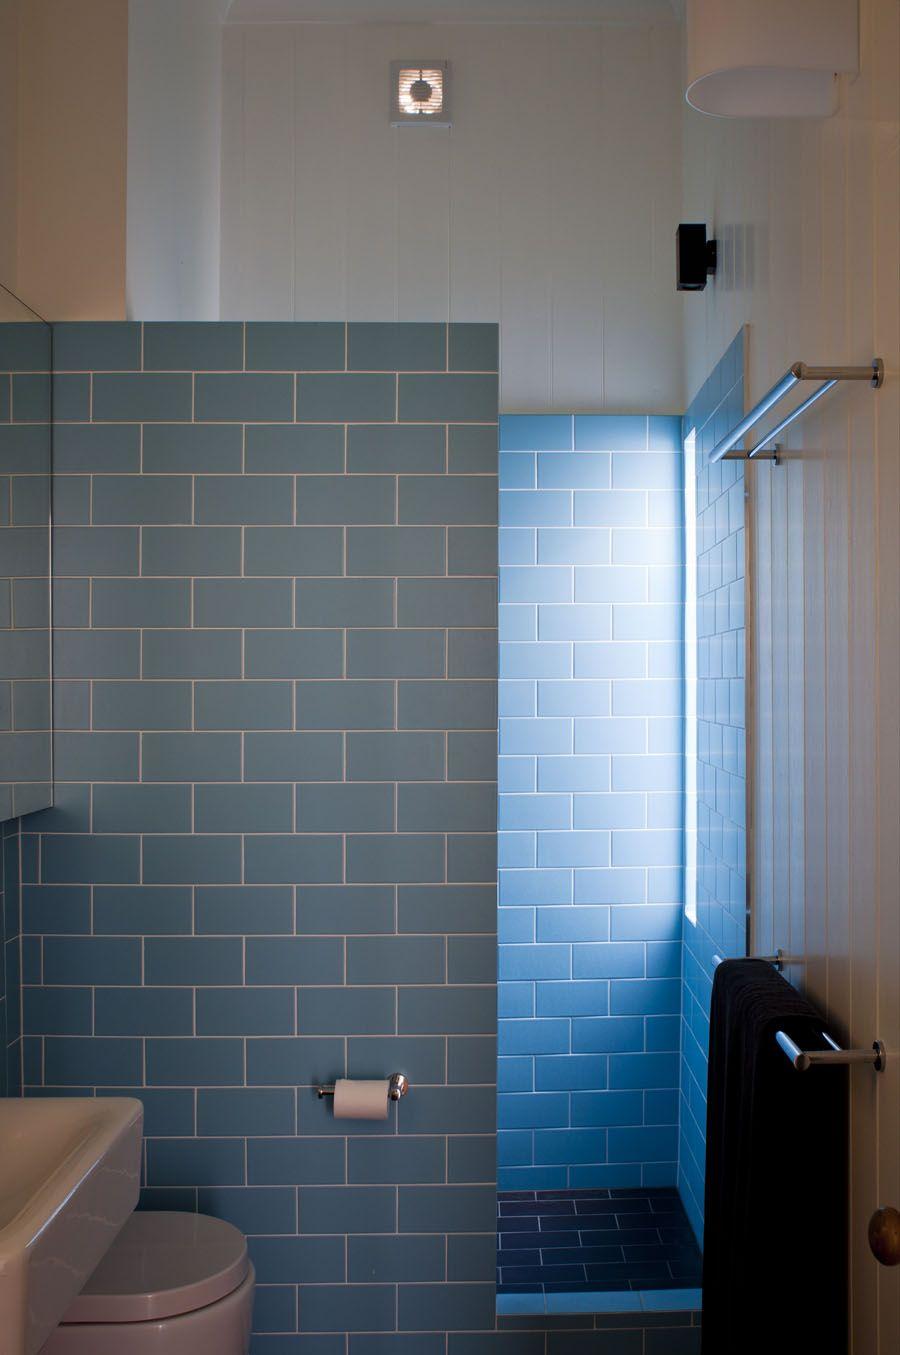 Gle Ensuite Shower Nib Wall No Curtain Screen Tiles Coloured